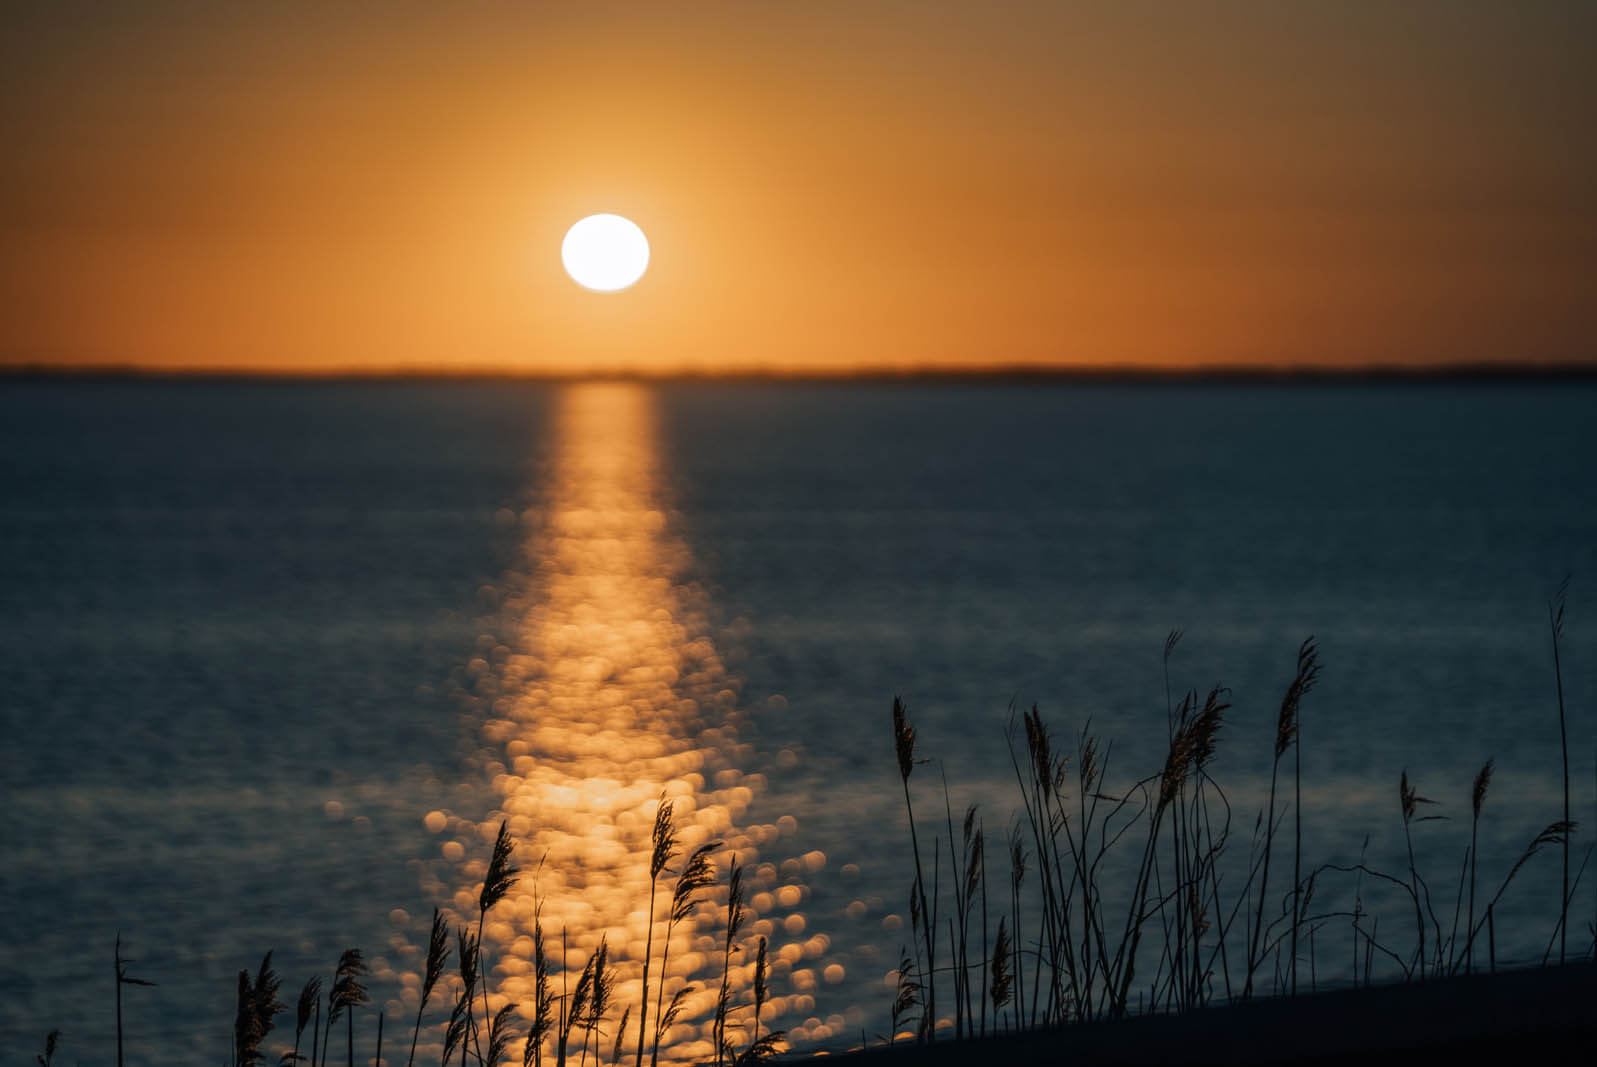 sunset view from Montauket in the Hamptons New York